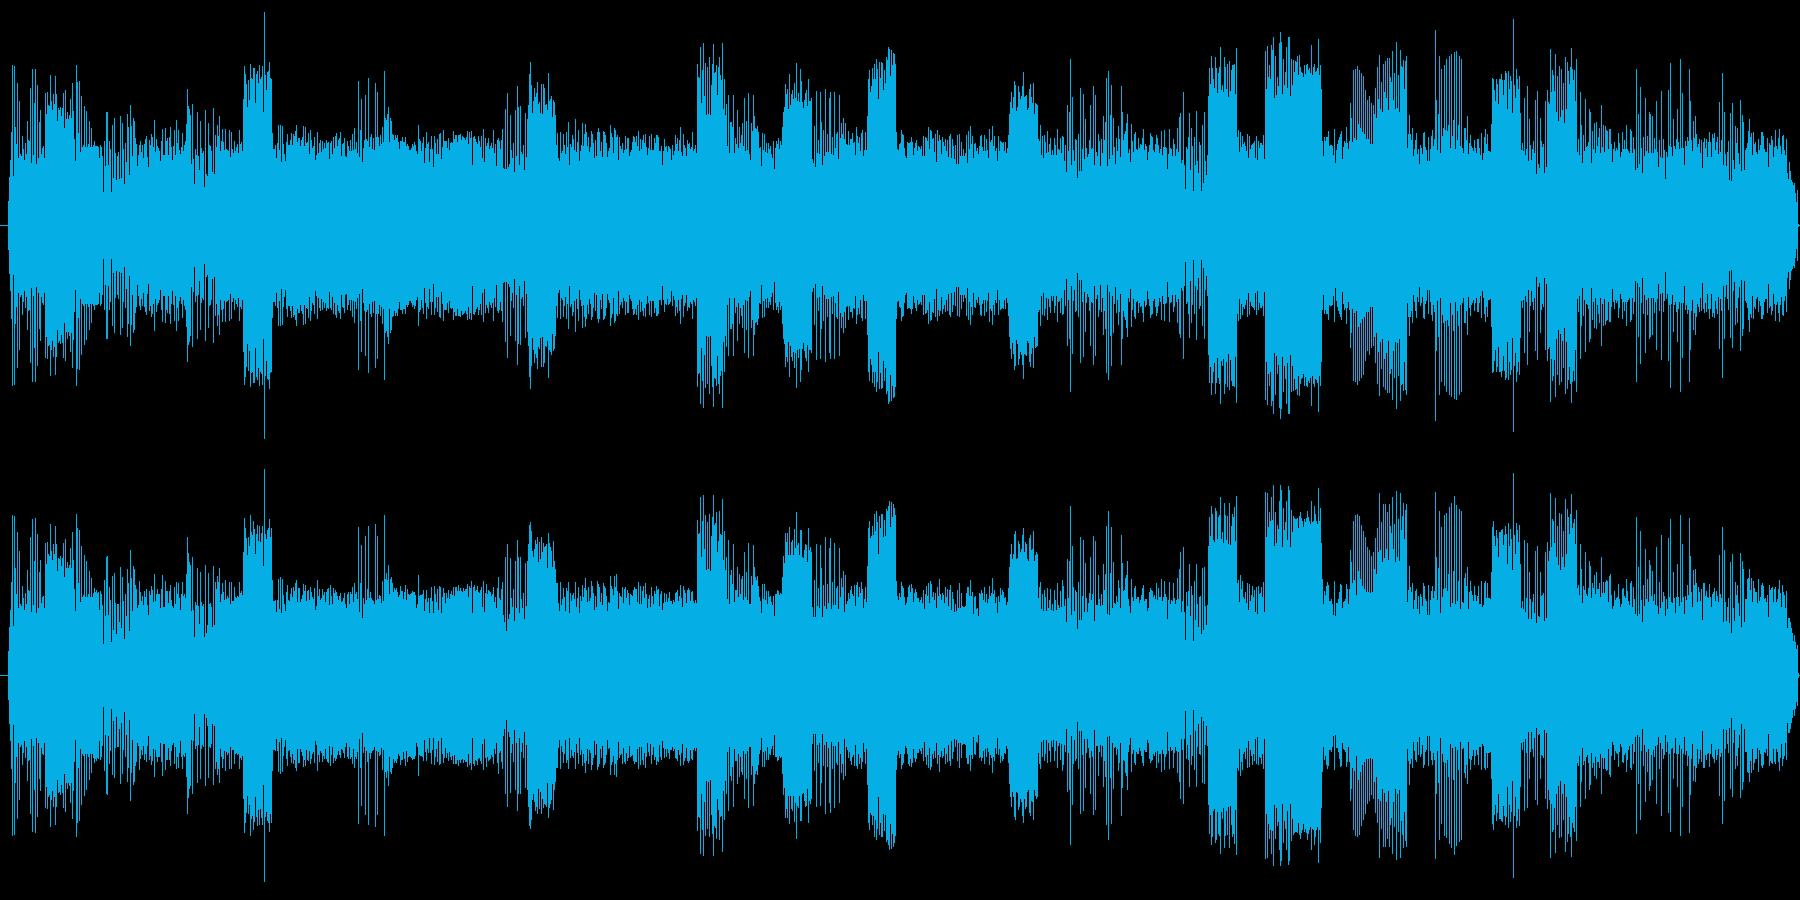 SF世界のマシンルームでコンピュータが…の再生済みの波形